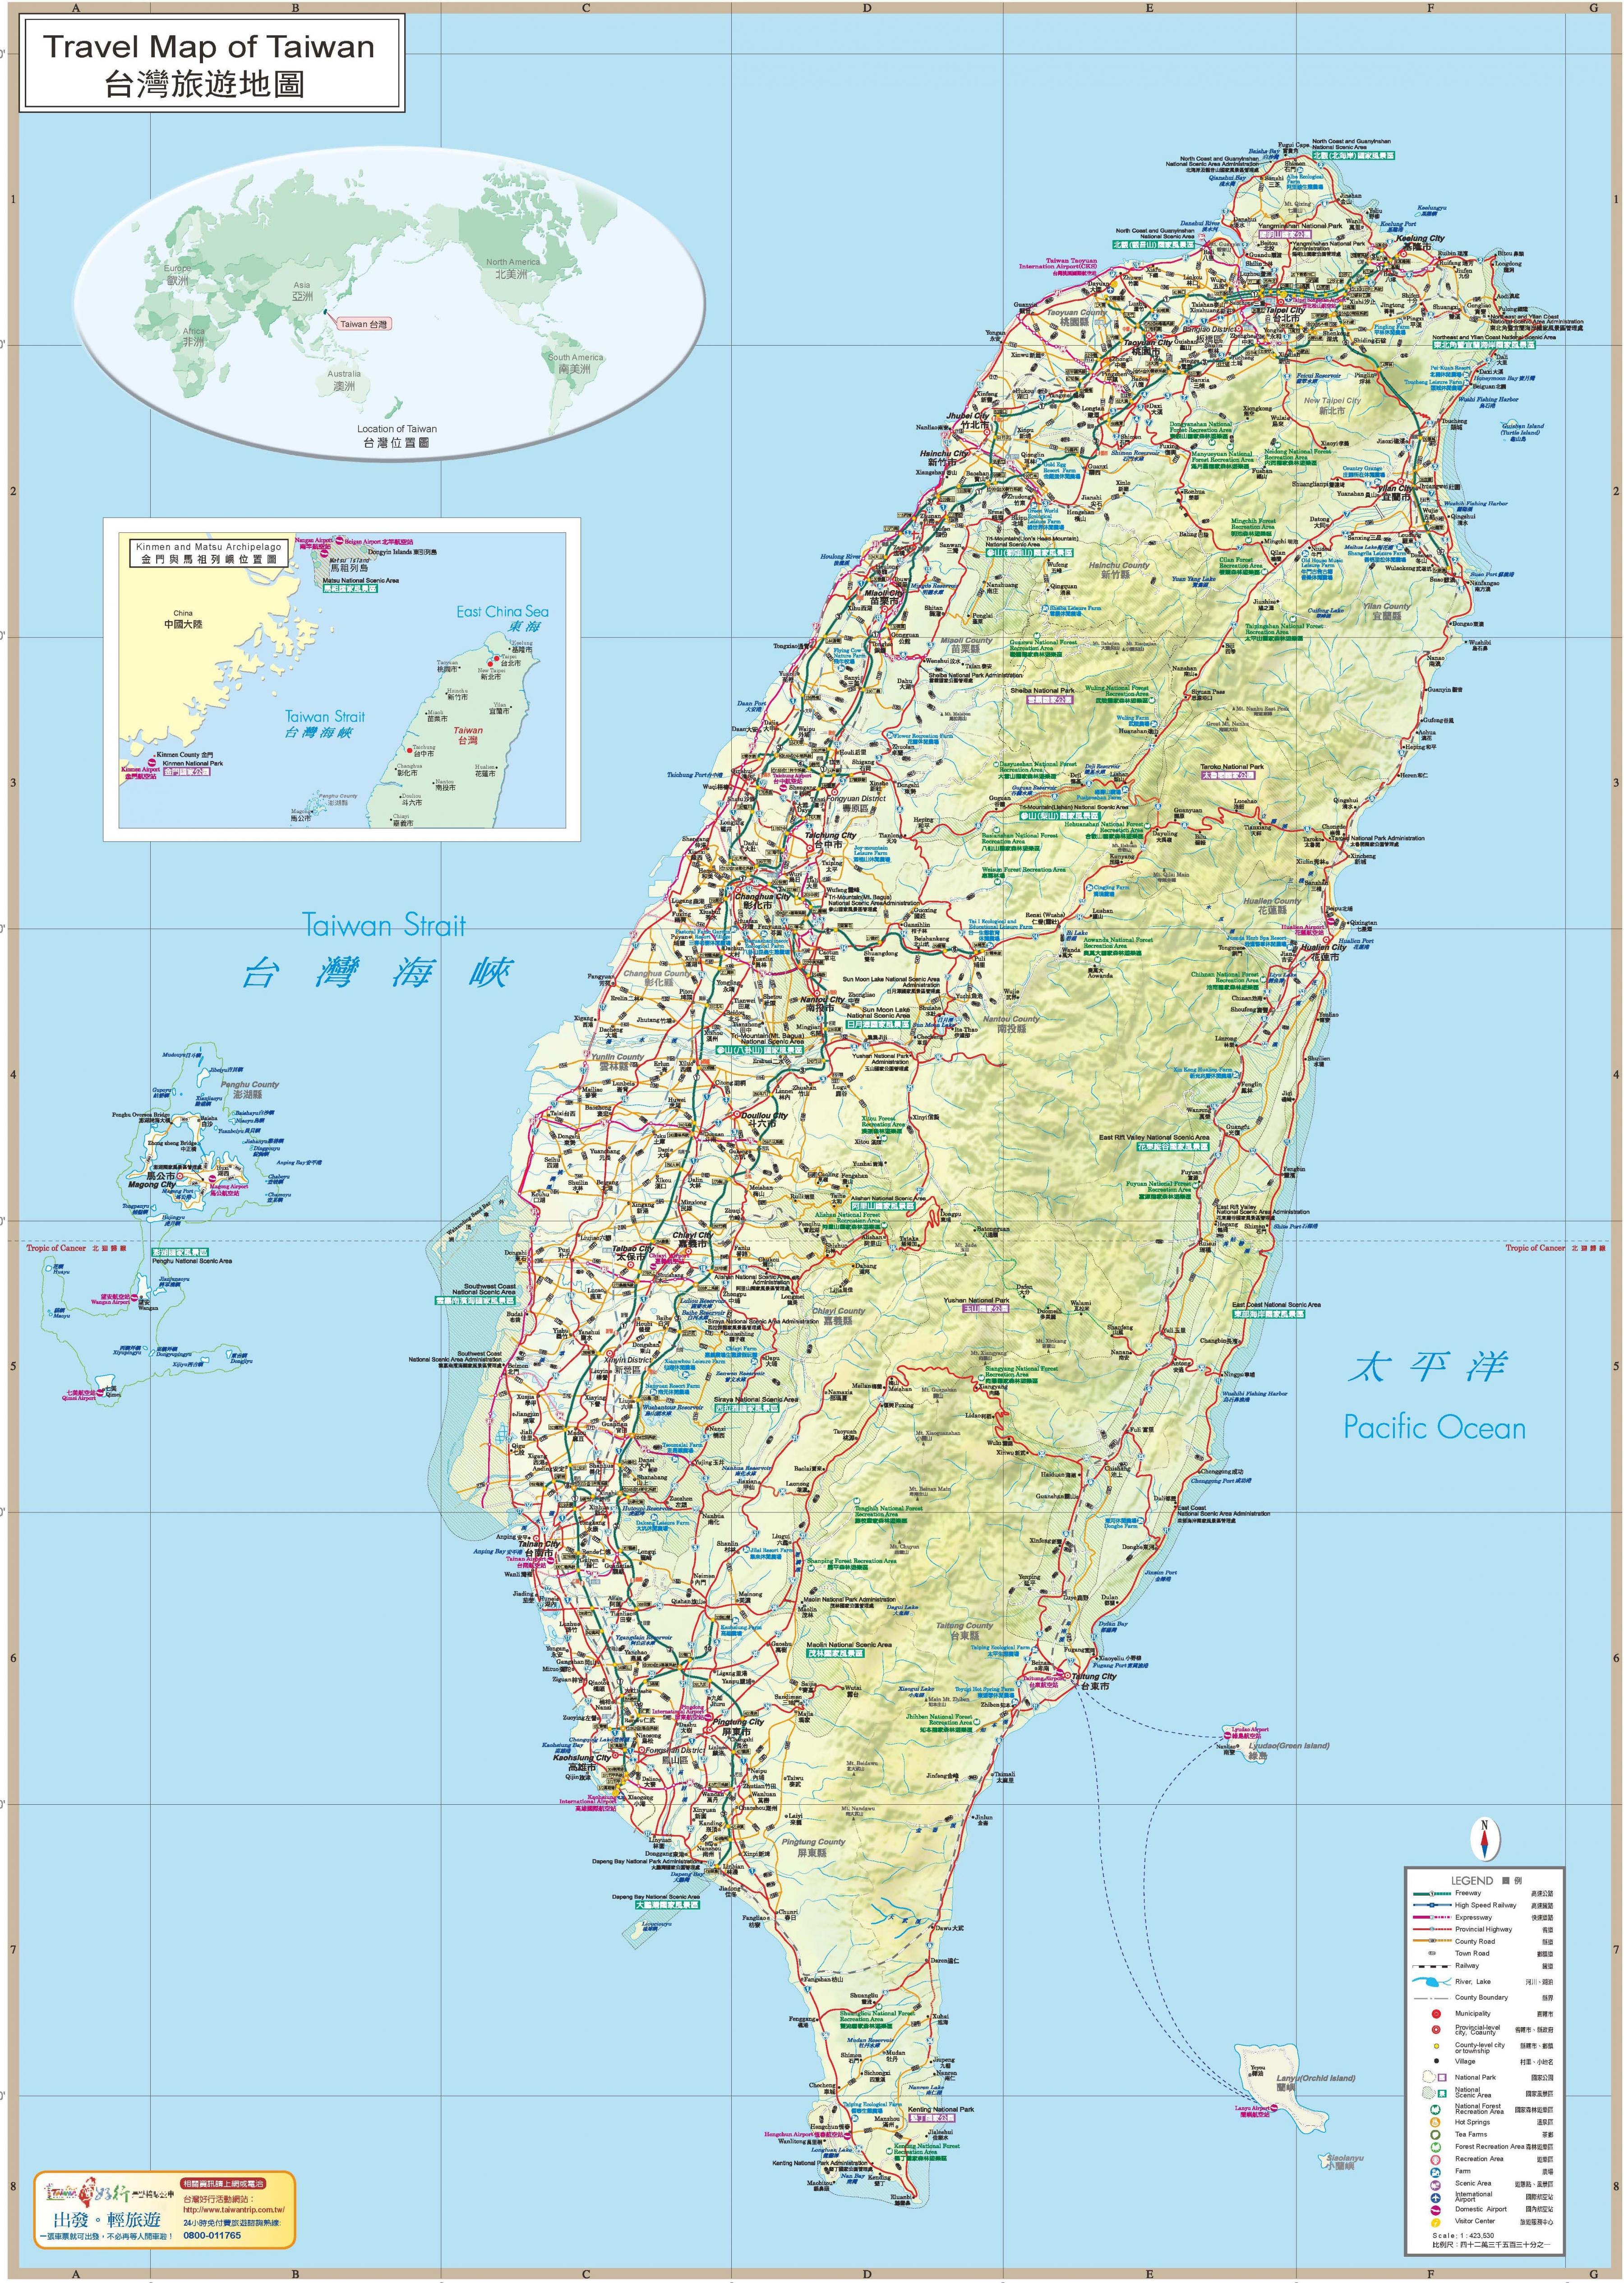 Taiwan Turist Kort Kort Over Taiwan Turist Attraktioner Ostlige